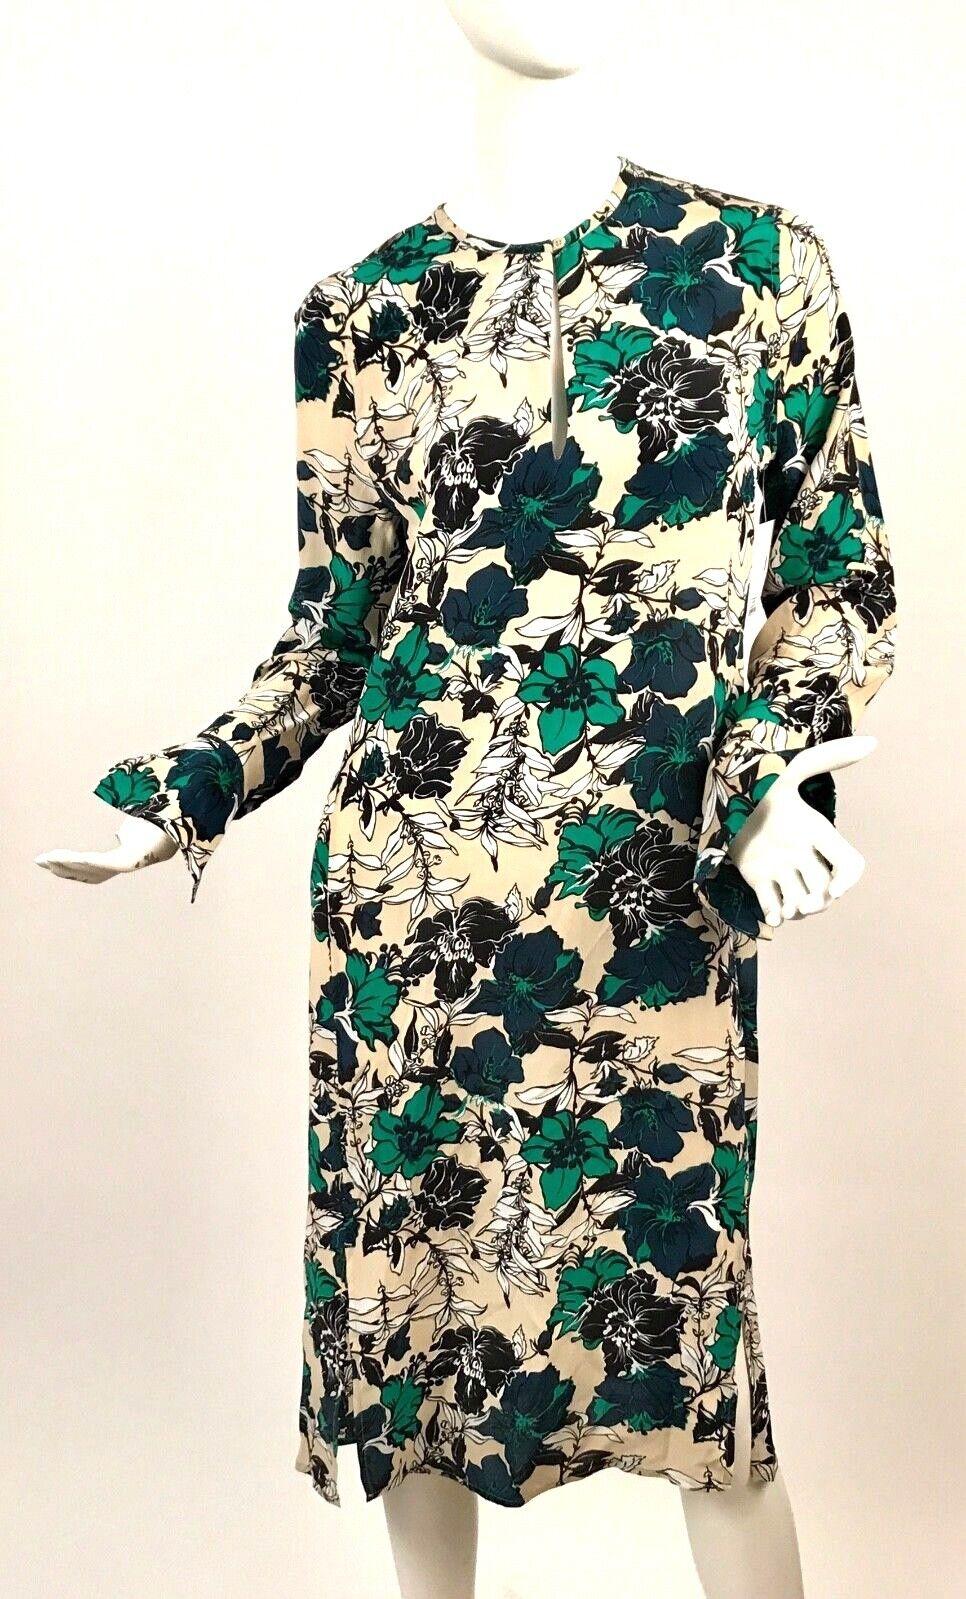 NWT Equipment Granger Silk Multicolor Knee Length Long Sleeve Floral Dress SZ S